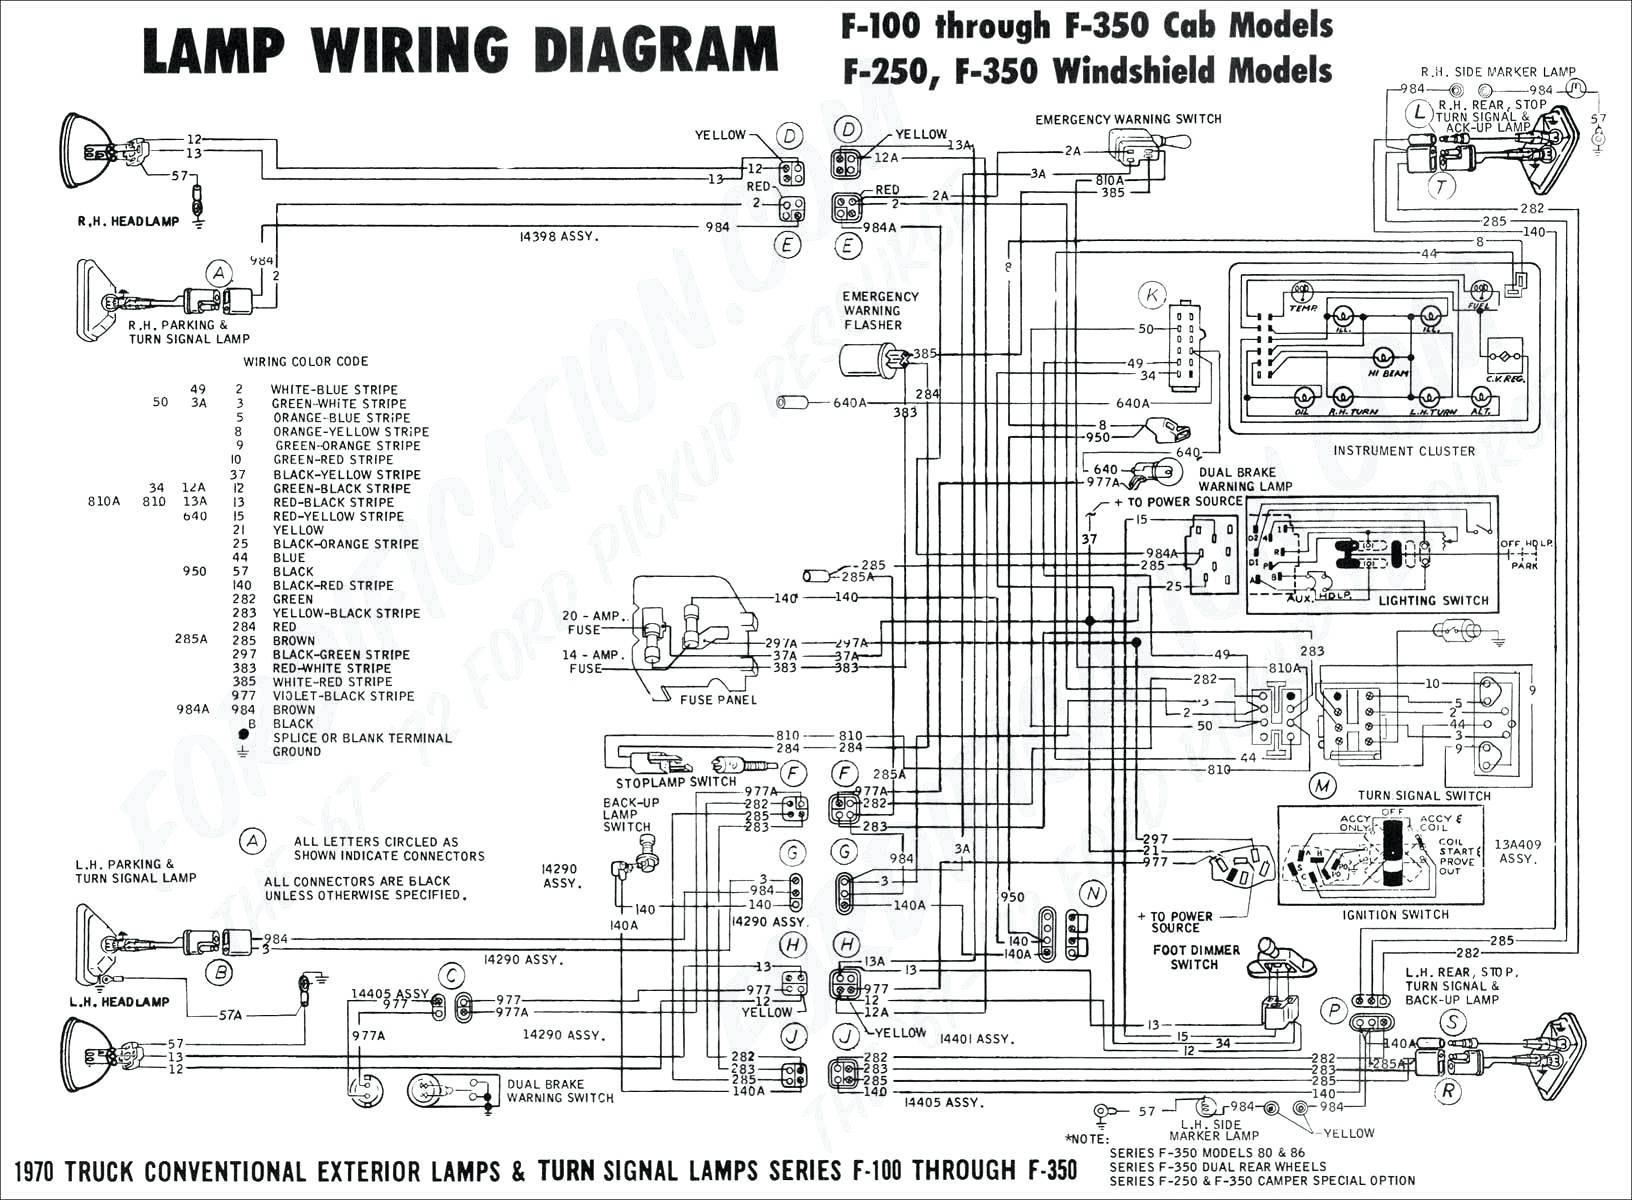 2010 Ford Escape Engine Diagram My Wiring Diagram